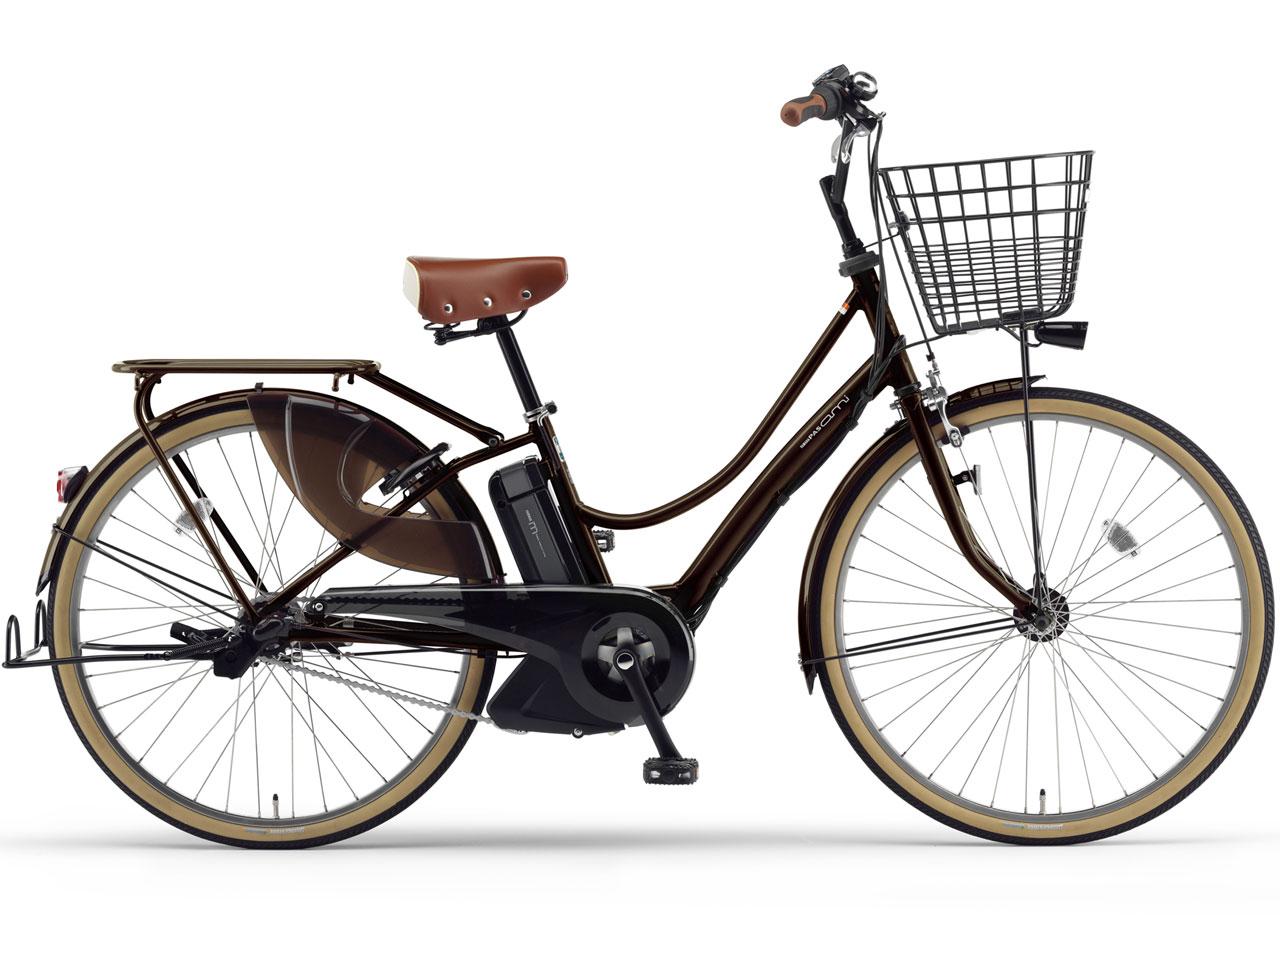 ... 自転車・原付バイク・電動